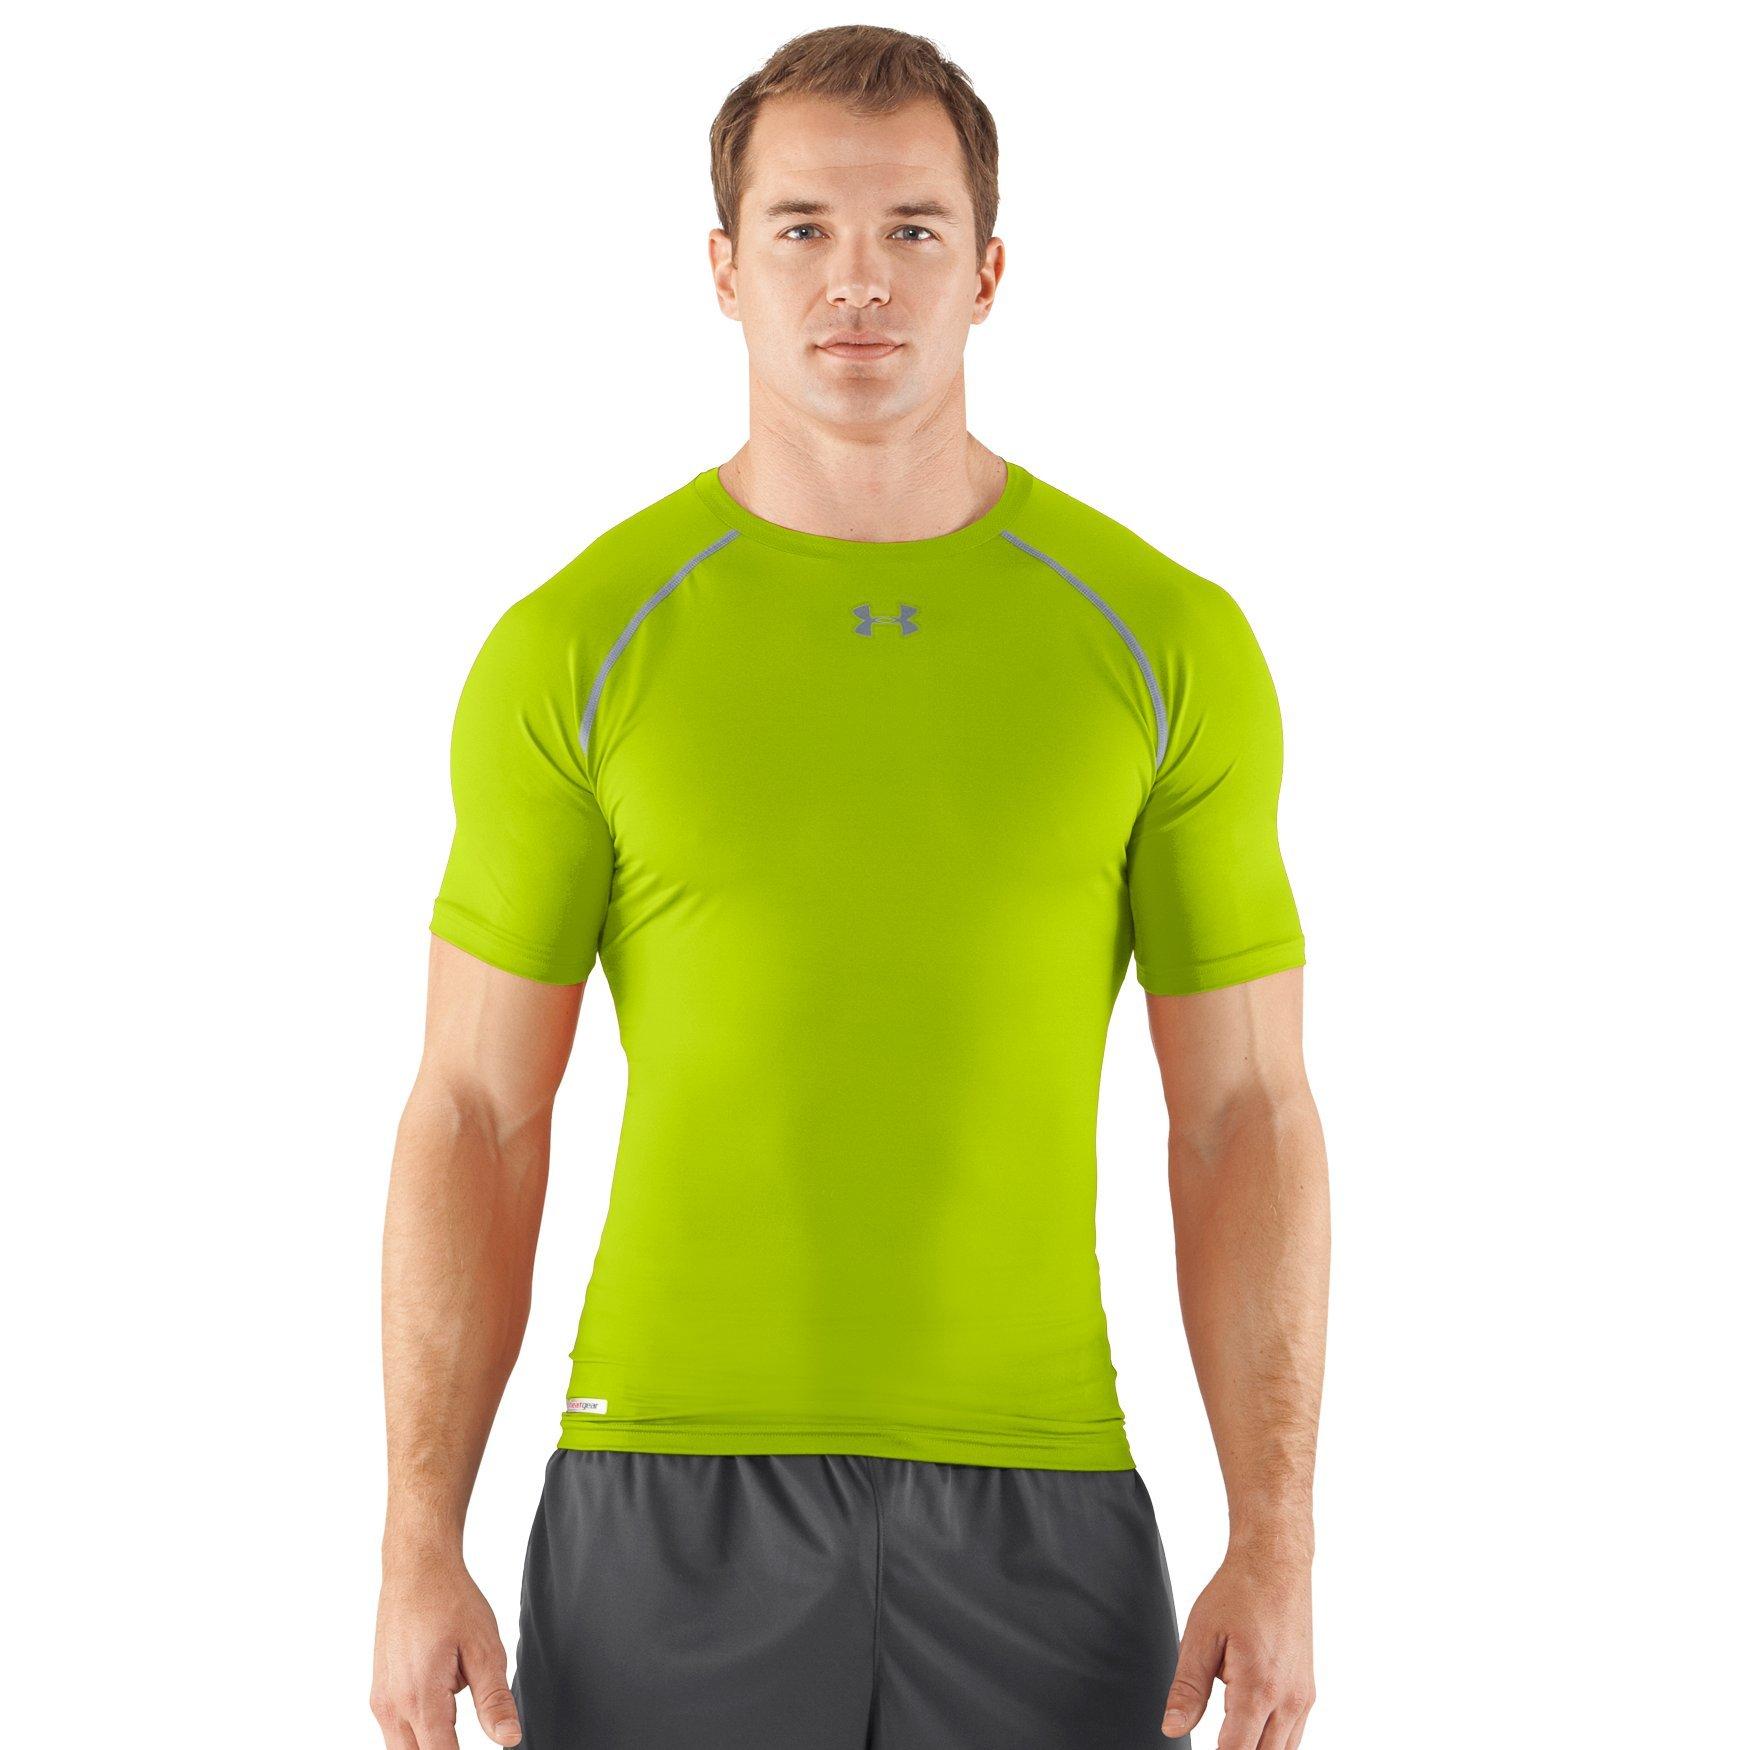 Under Armour Men/'s UA Compression Long Sleeve HeatGear T-Shirt Sonic Workout Tee